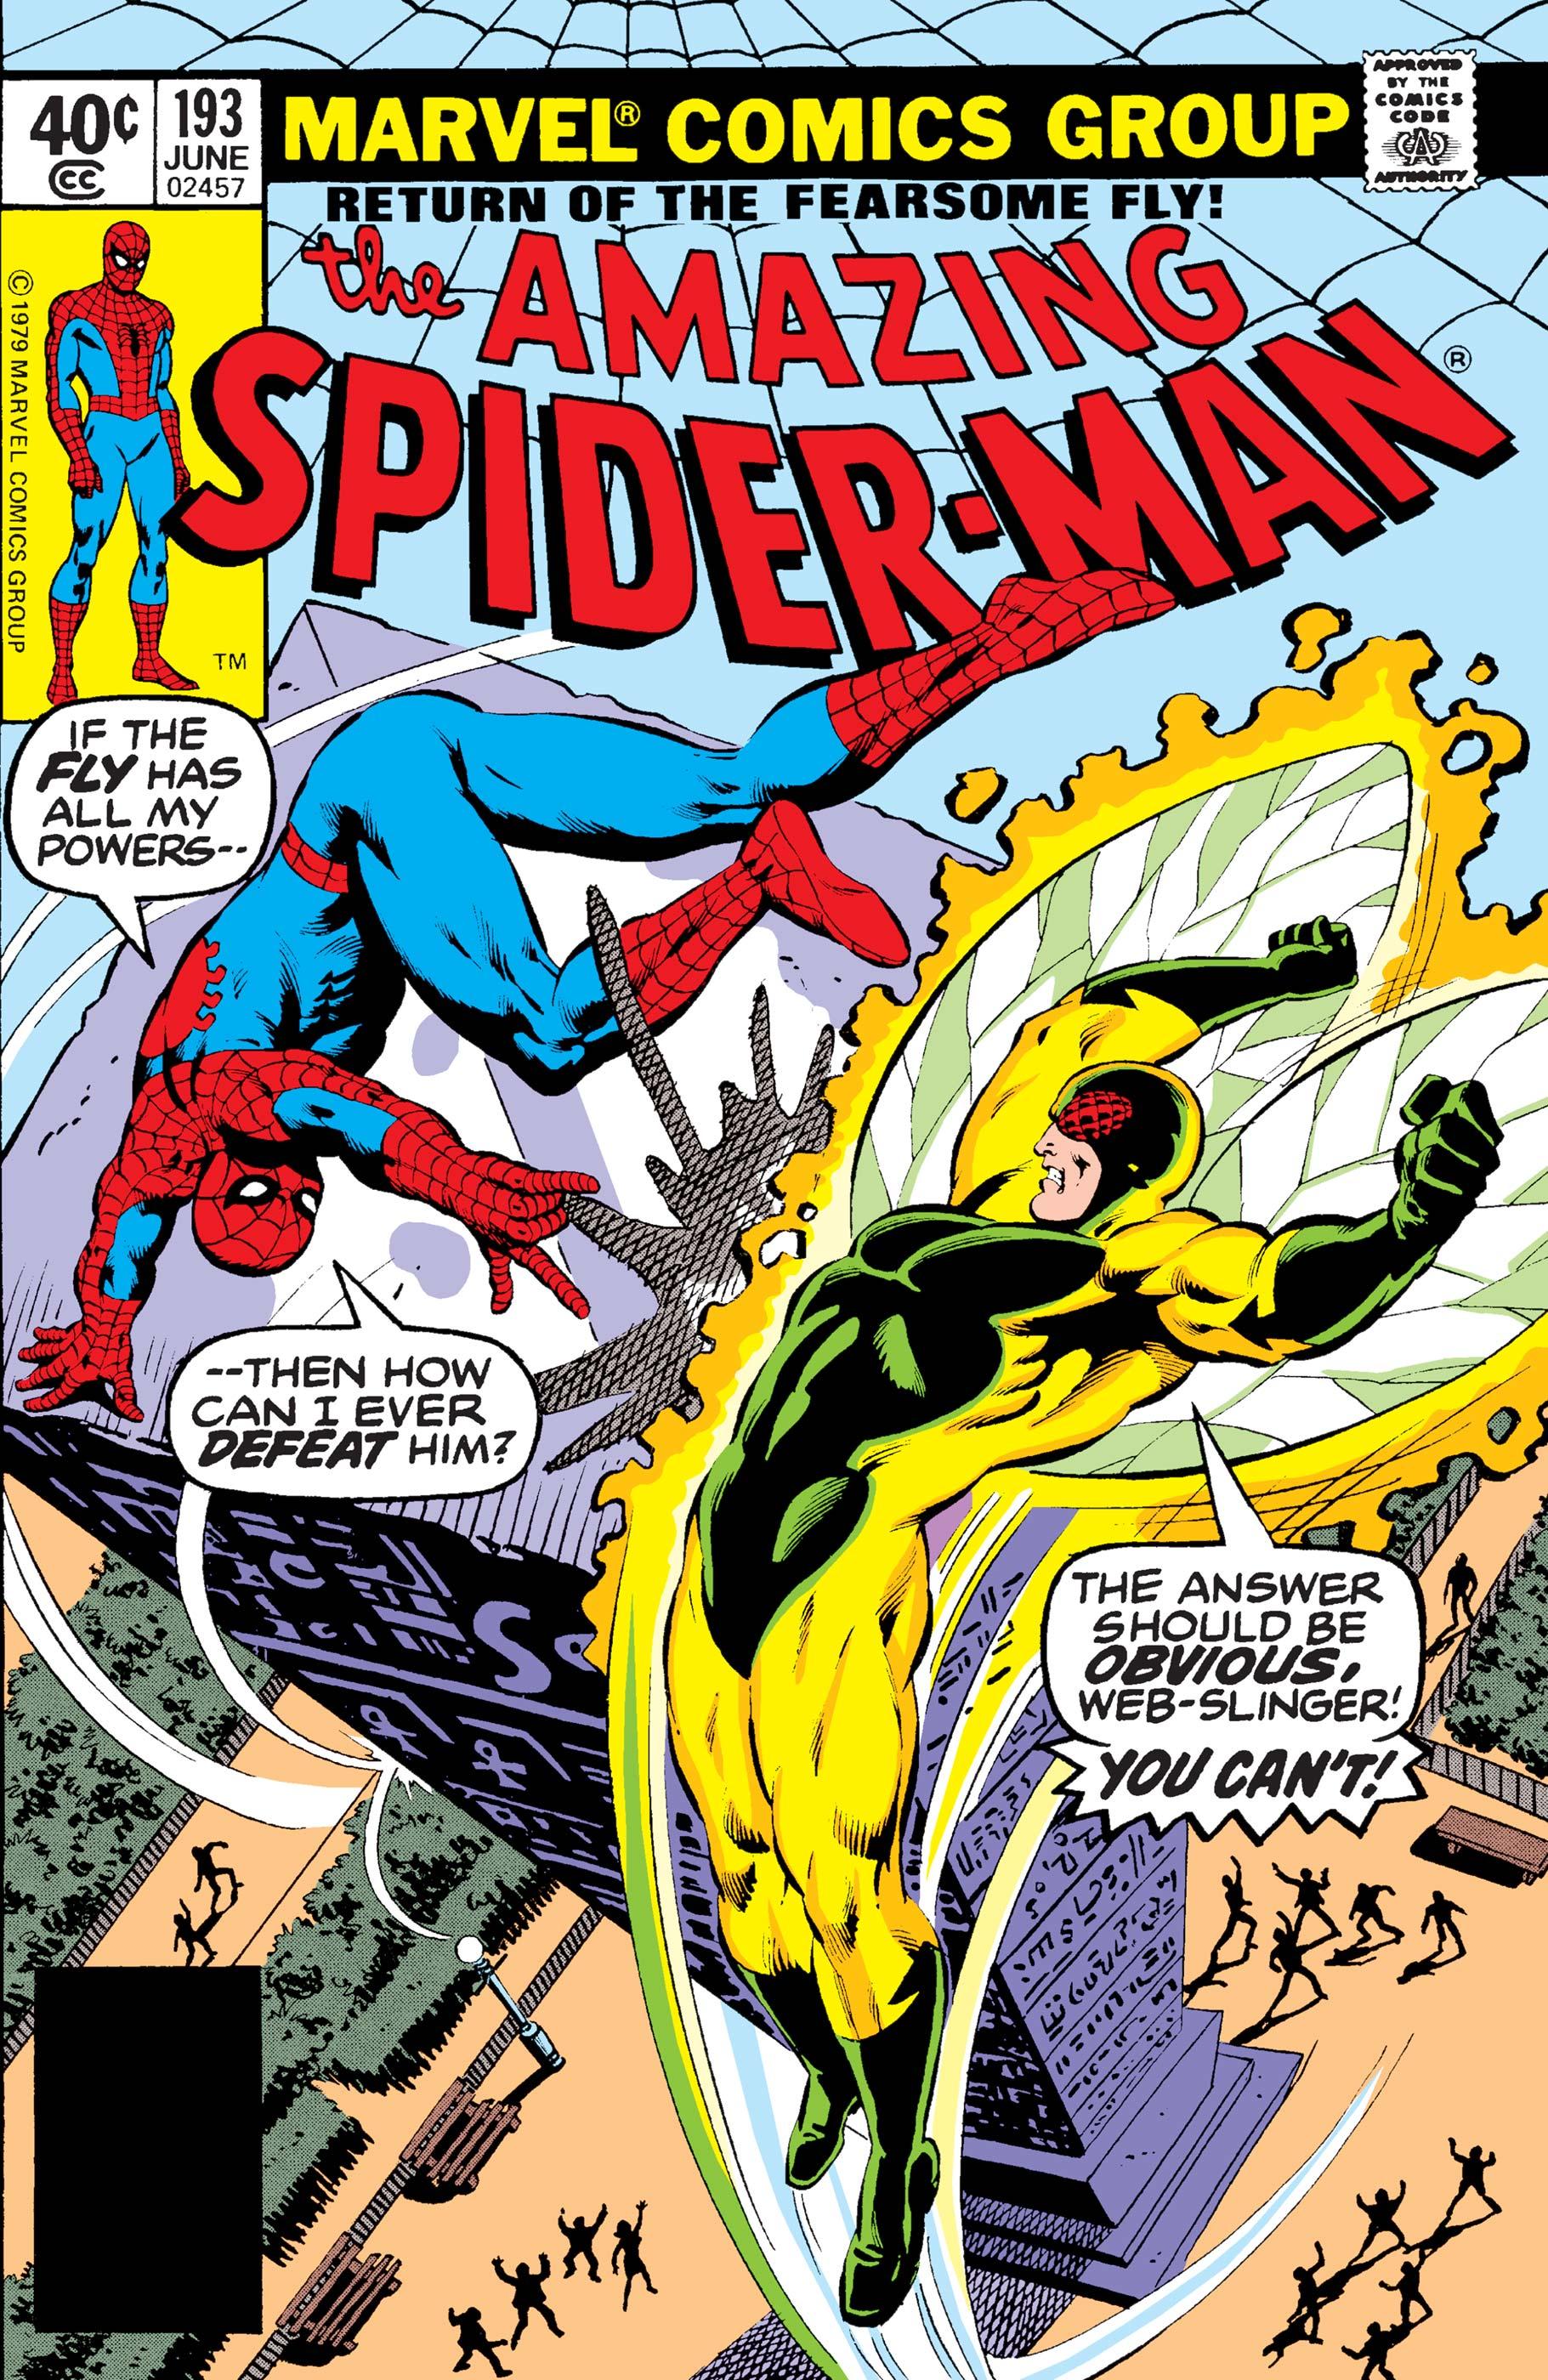 The Amazing Spider-Man (1963) #193